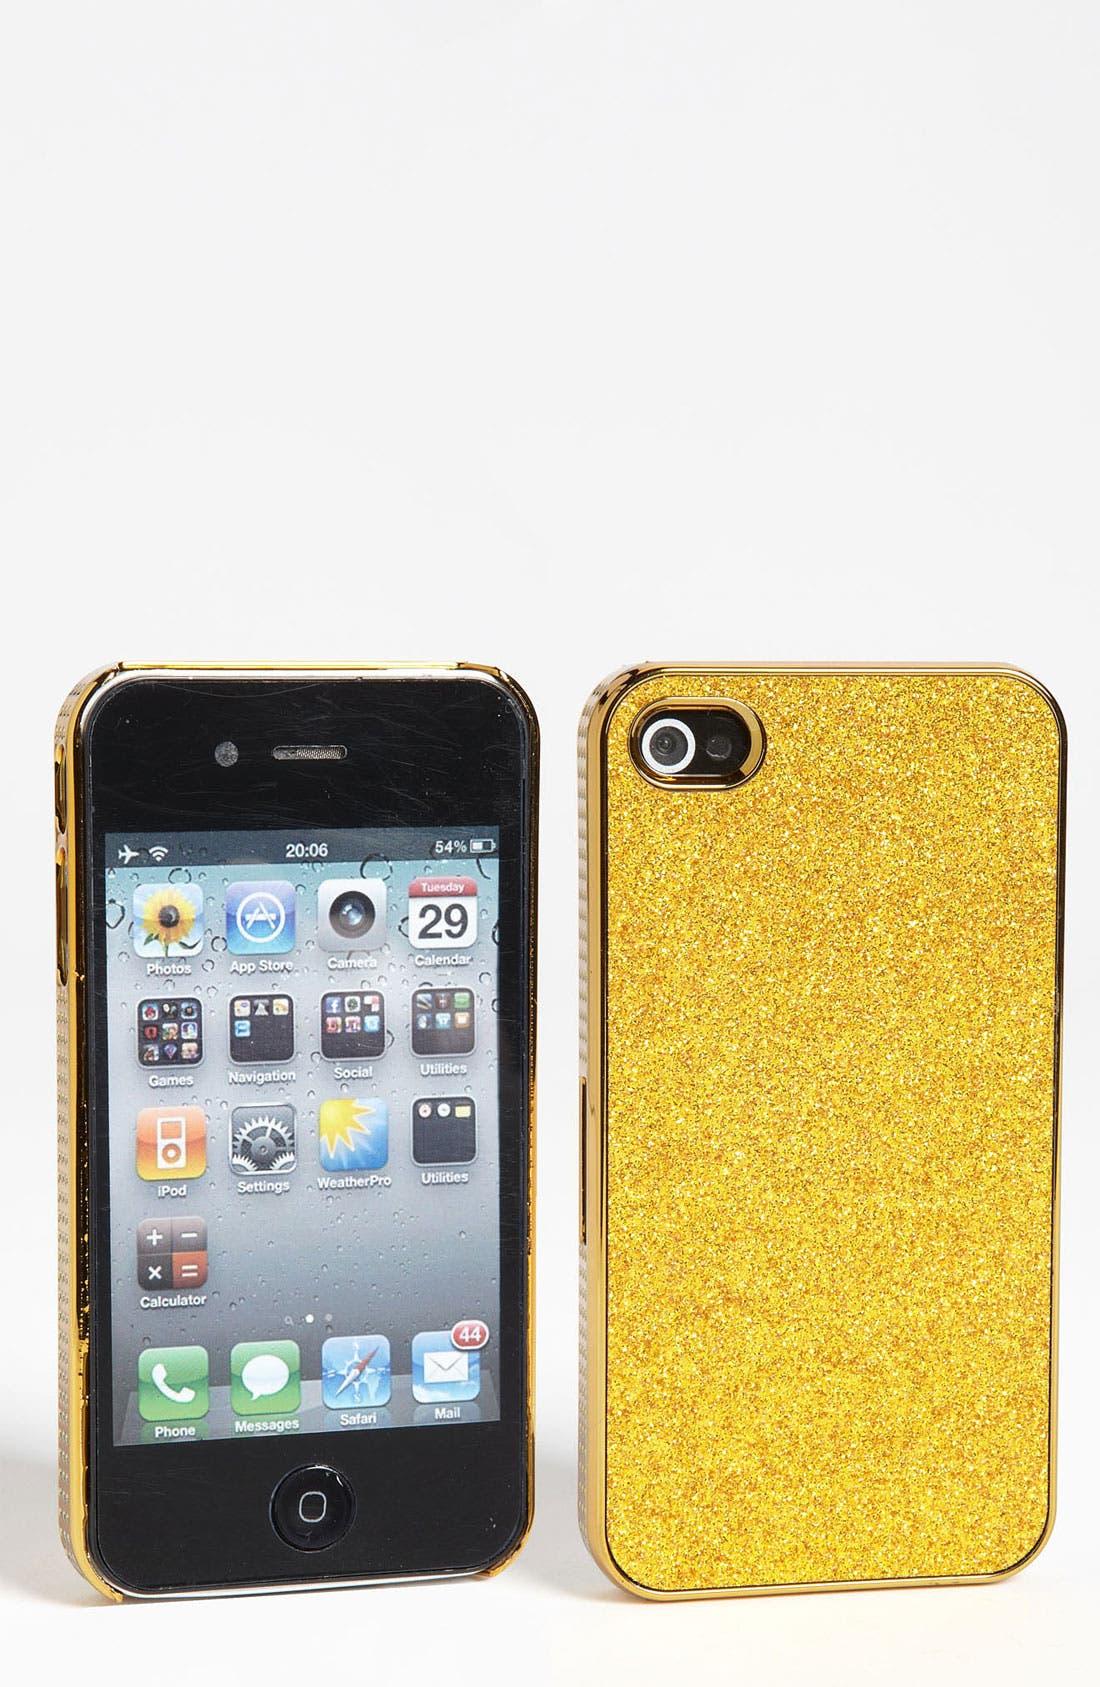 Main Image - Design Lab 'Glitter' iPhone 4 & 4S Case